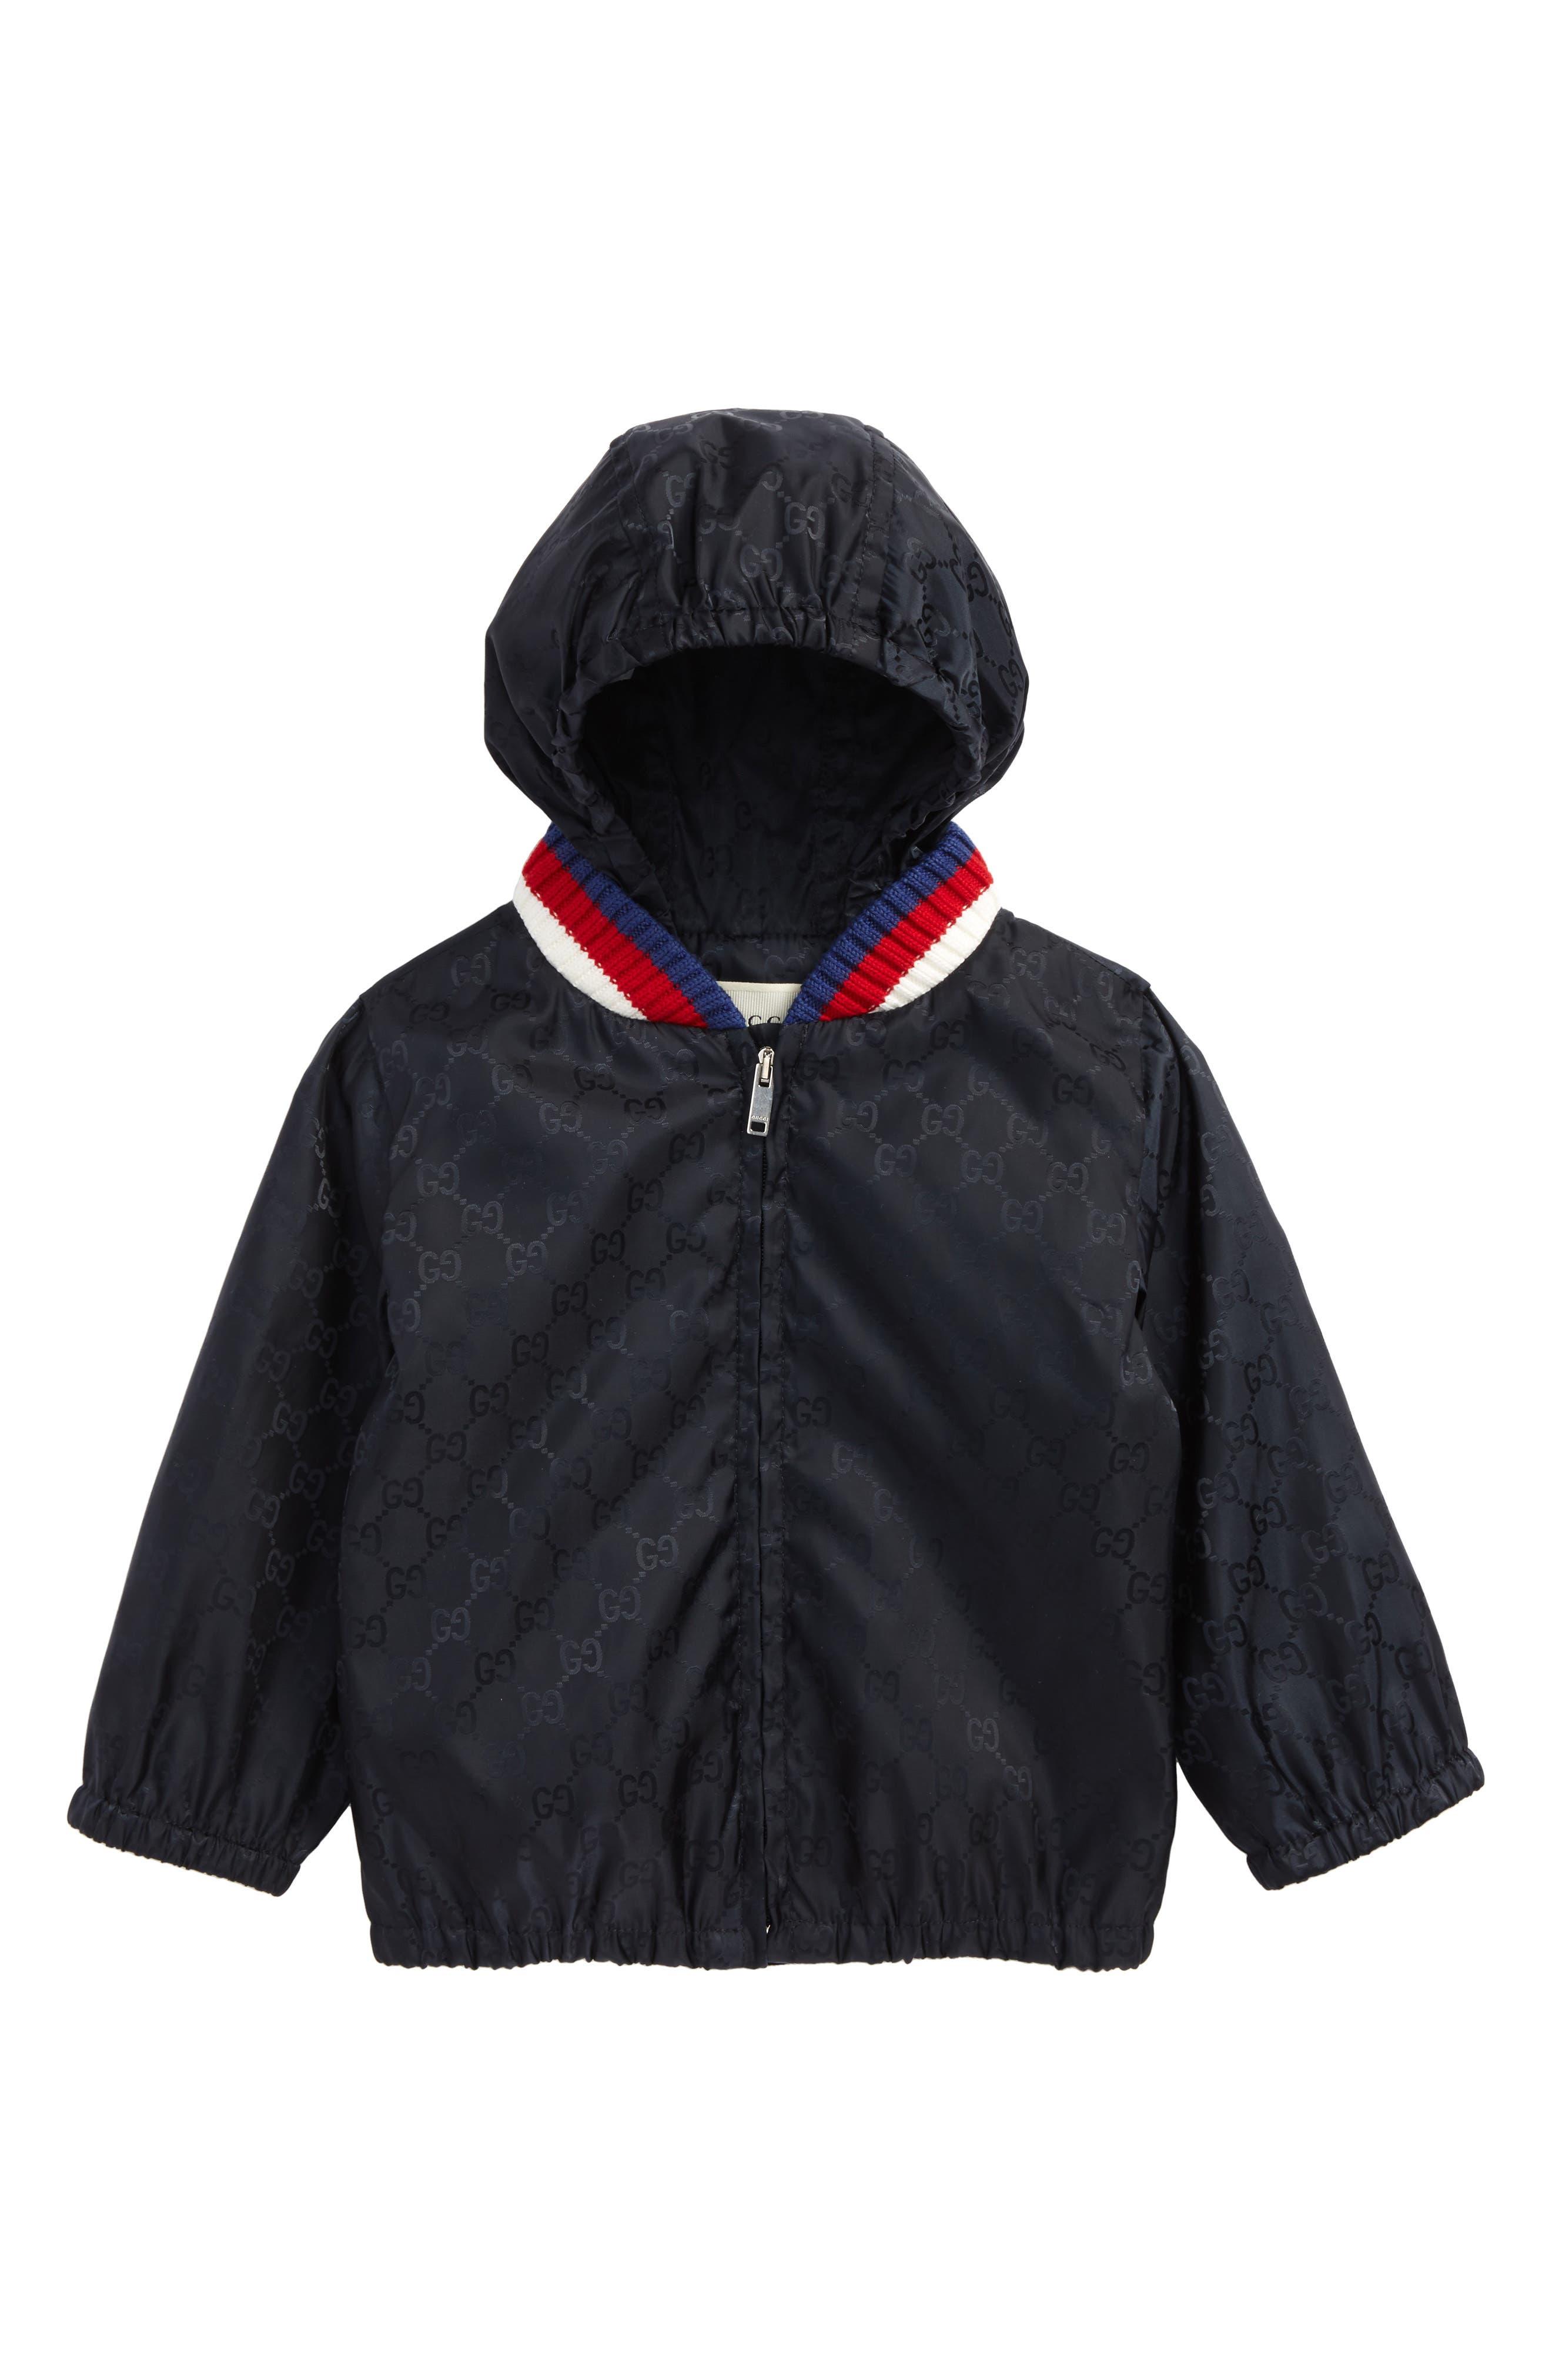 Alternate Image 1 Selected - Gucci GG Logo Jacquard Hooded Rain Jacket (Baby)